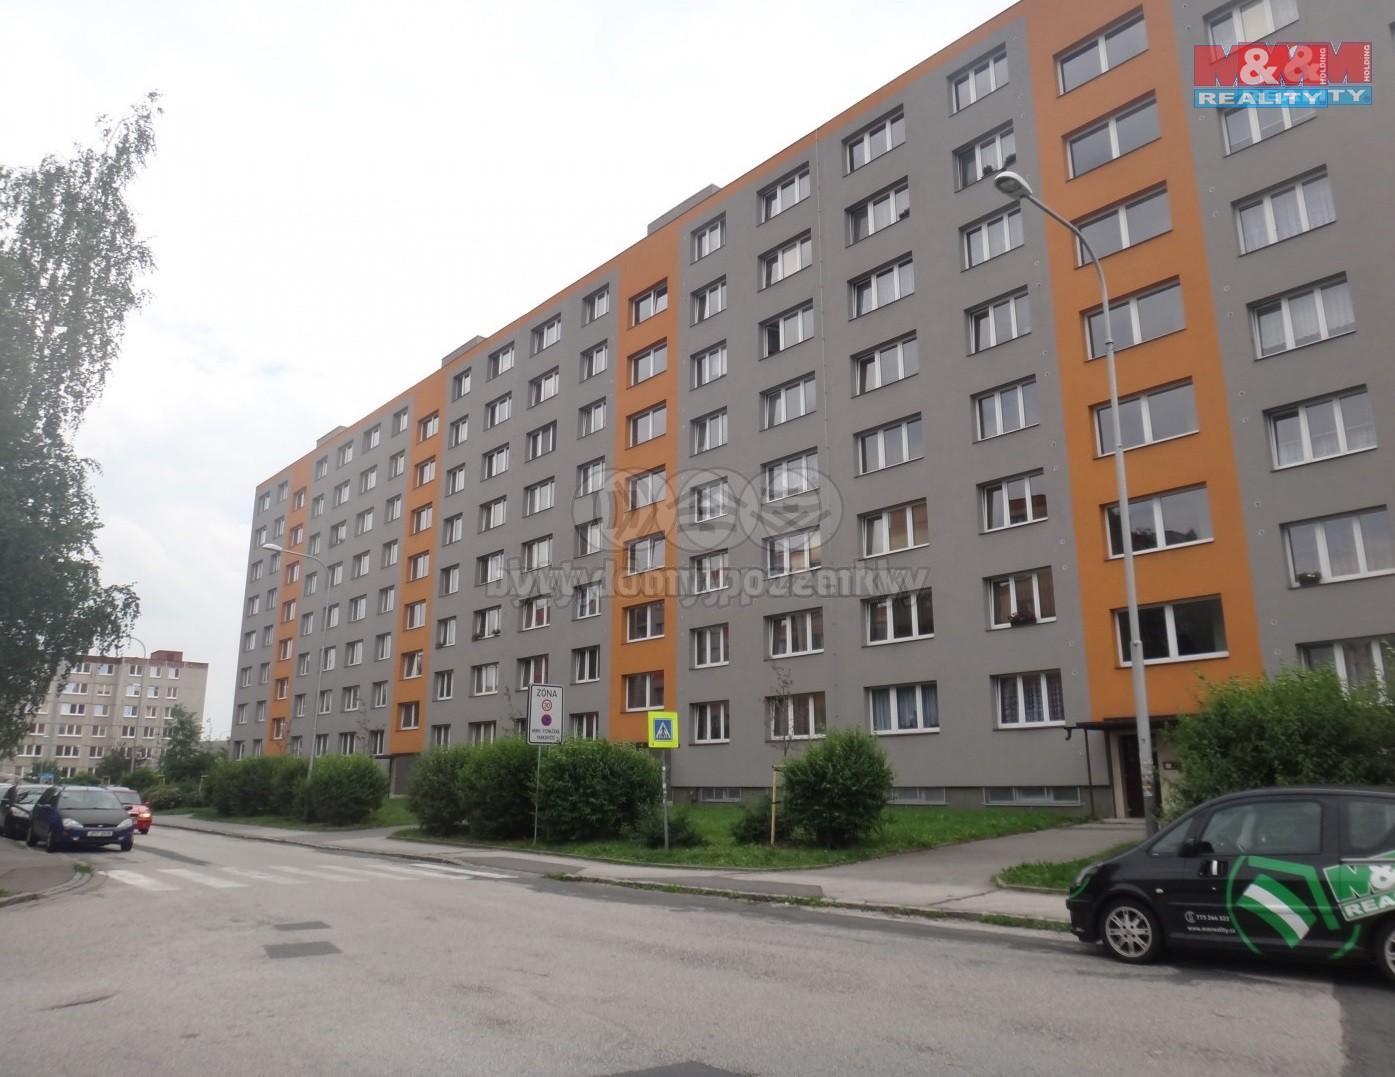 Prodej, byt 3+1, 74 m2, Ostrava - Dubina